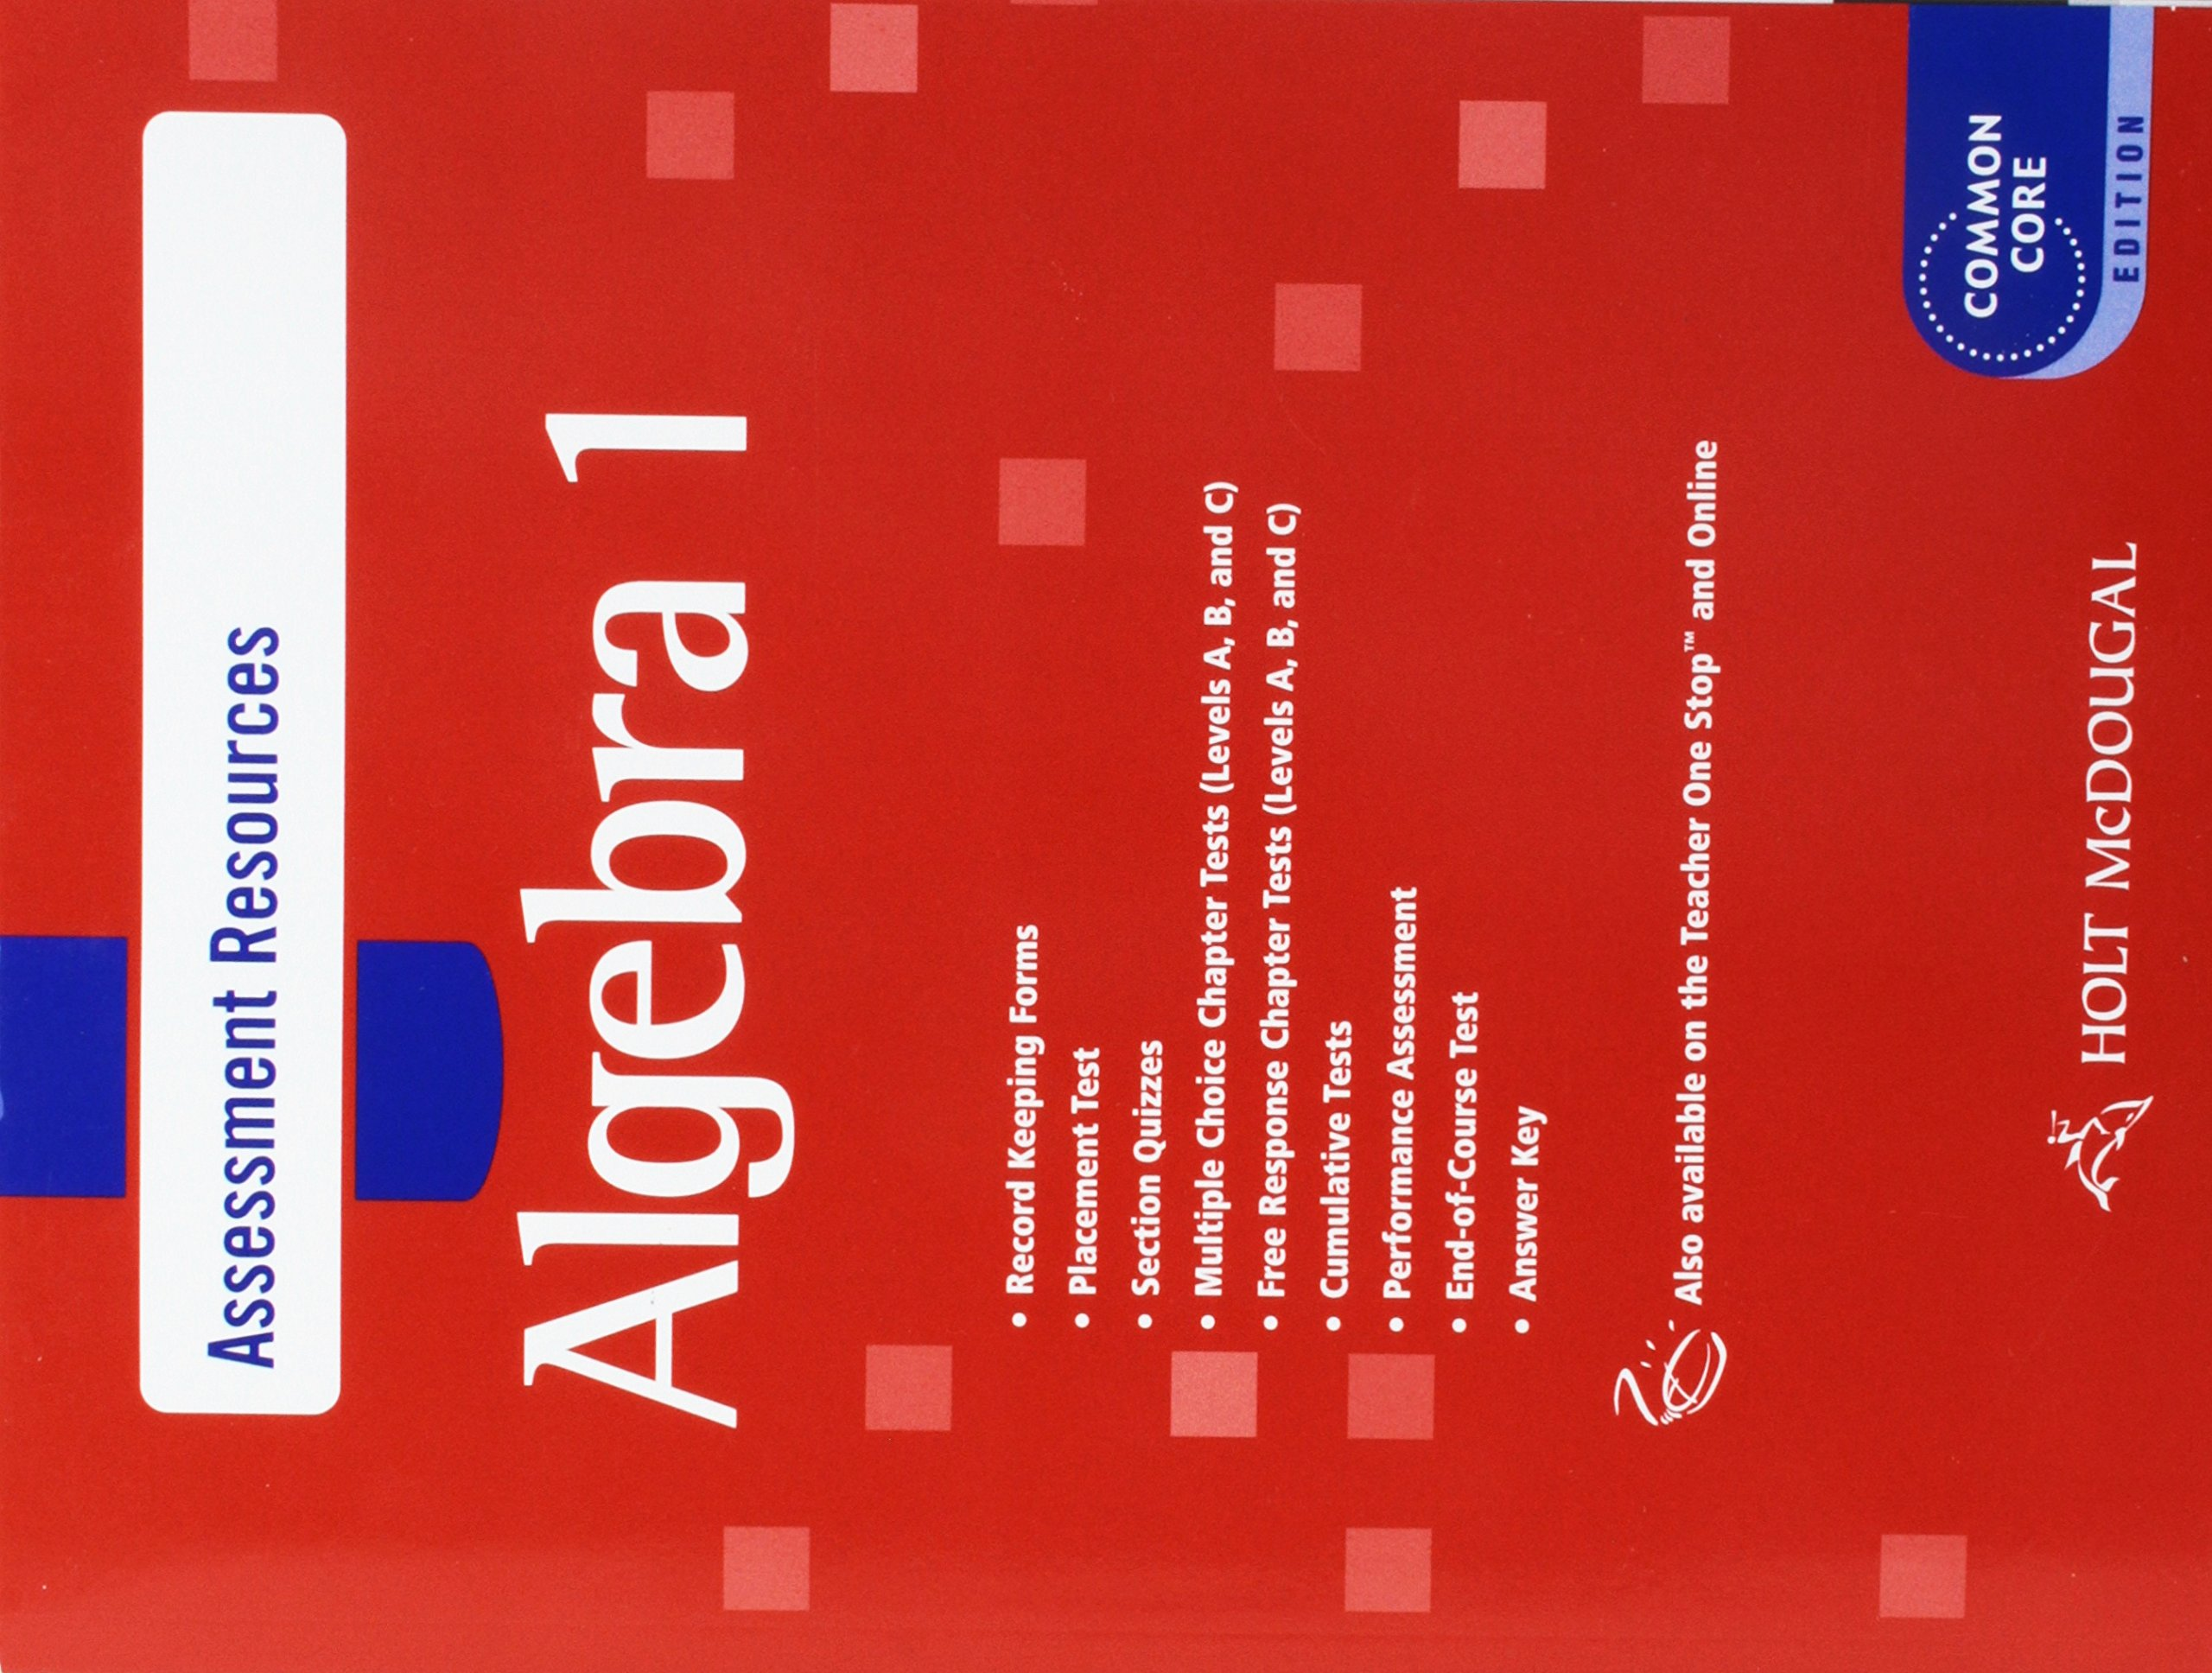 Larson Algebra 1 Textbook Pdf